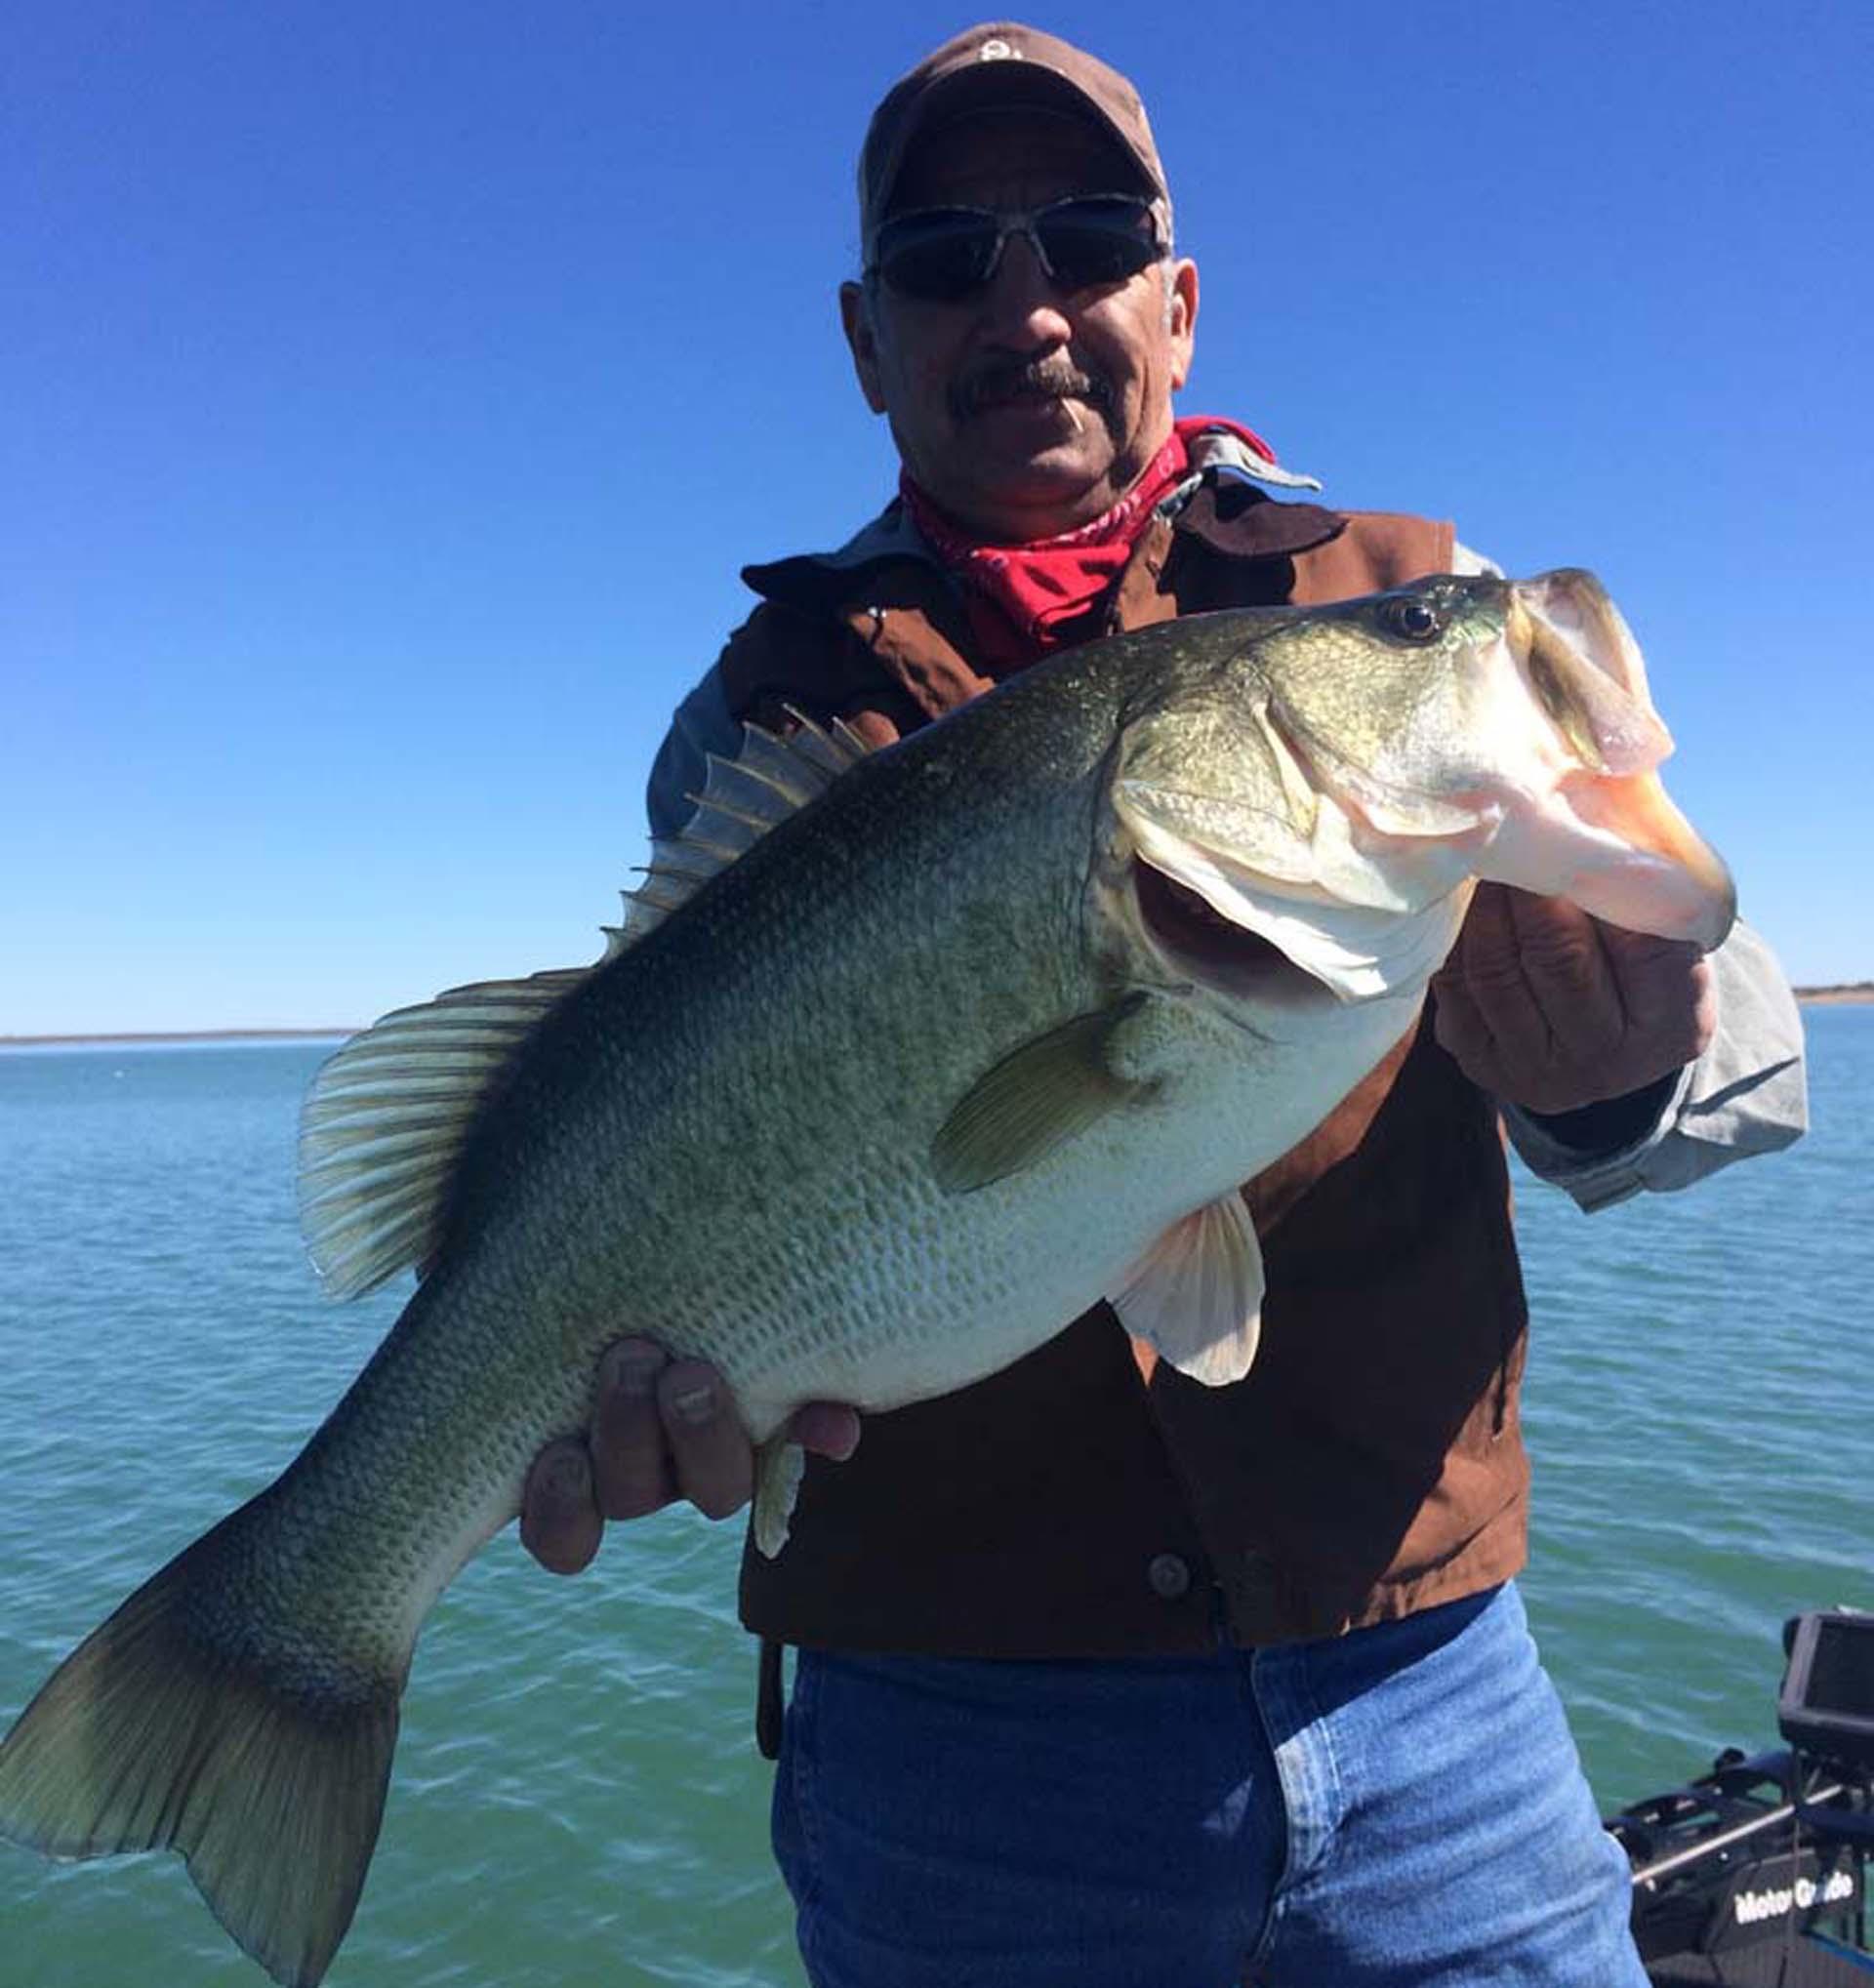 Lake amistad fishing guide amistad bass fishing guide lake for Best bass fishing lakes in texas